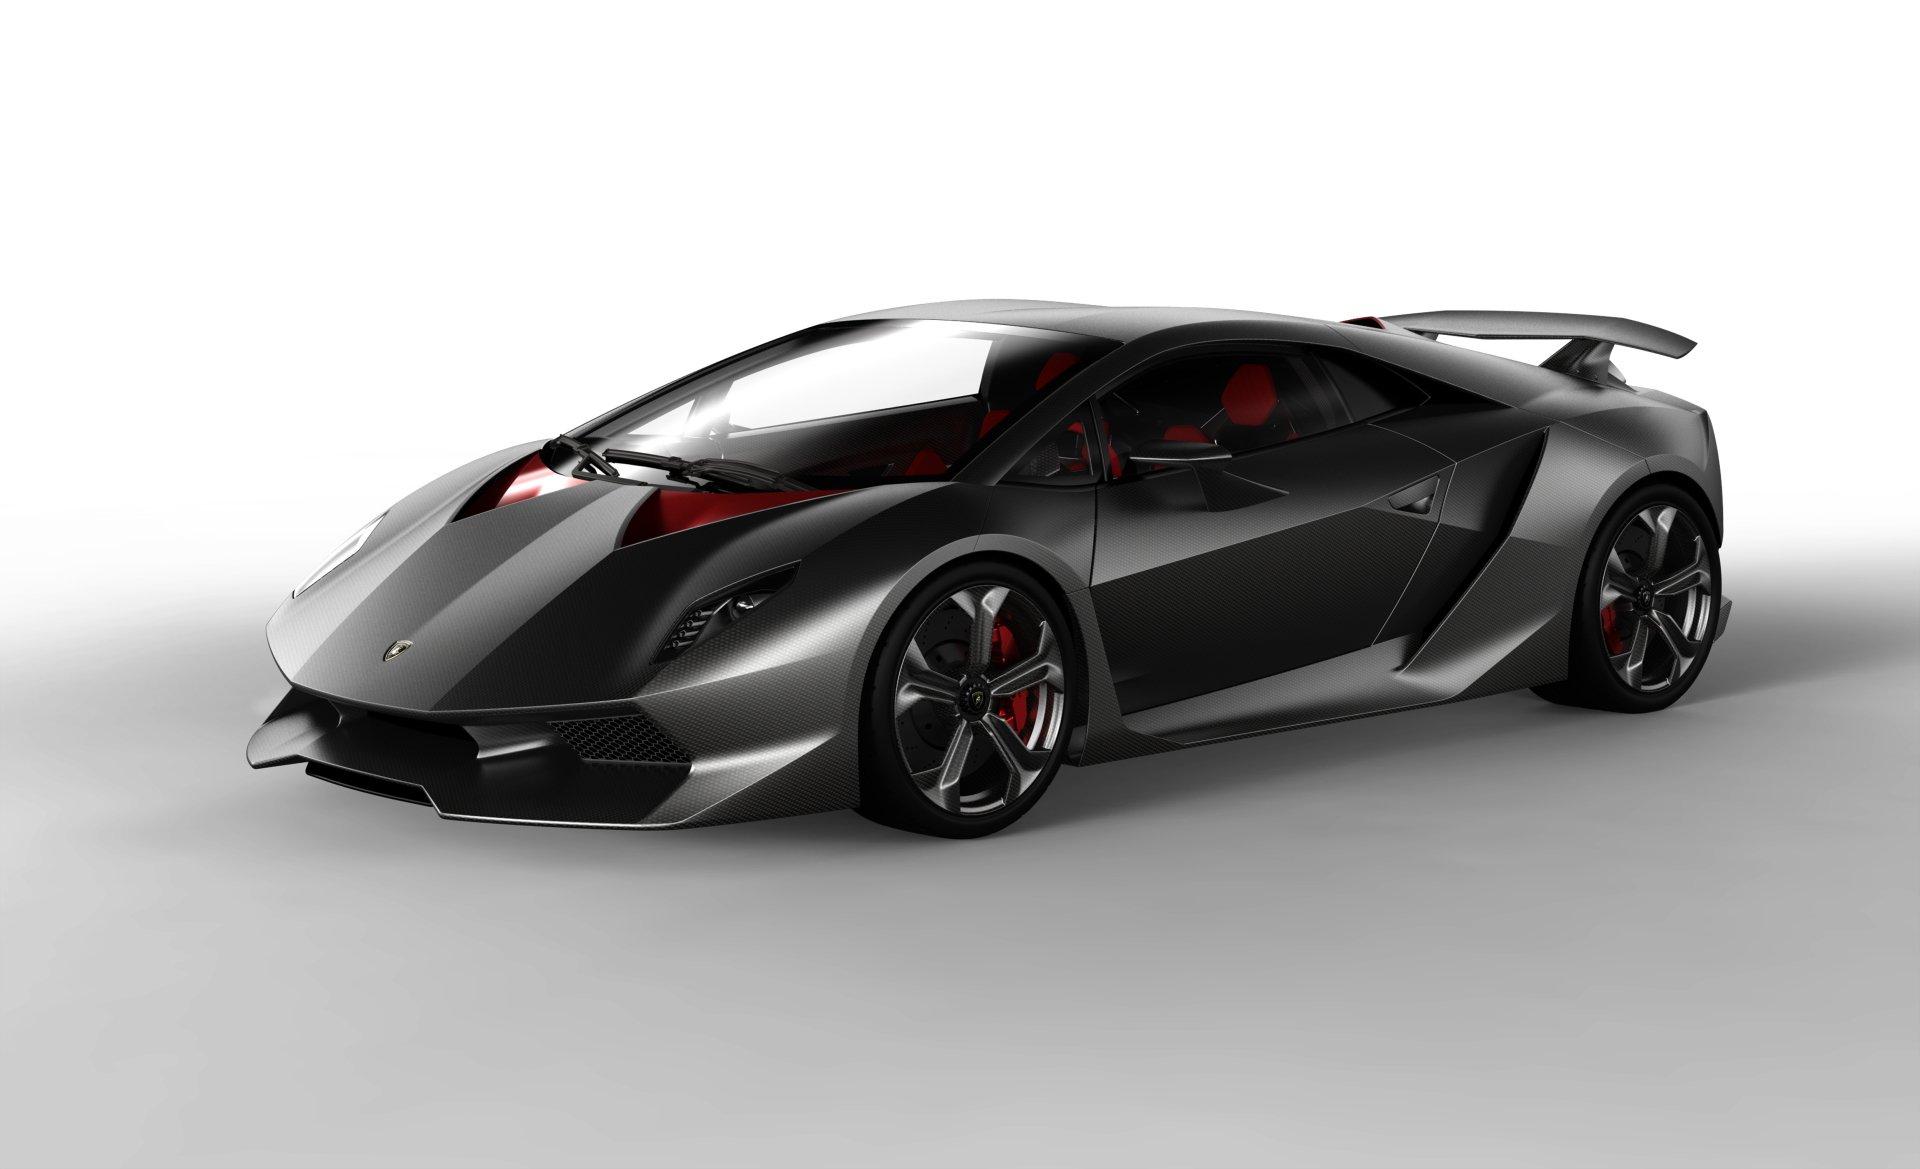 1 4k Ultra Hd Lamborghini Sesto Elemento Wallpapers Background